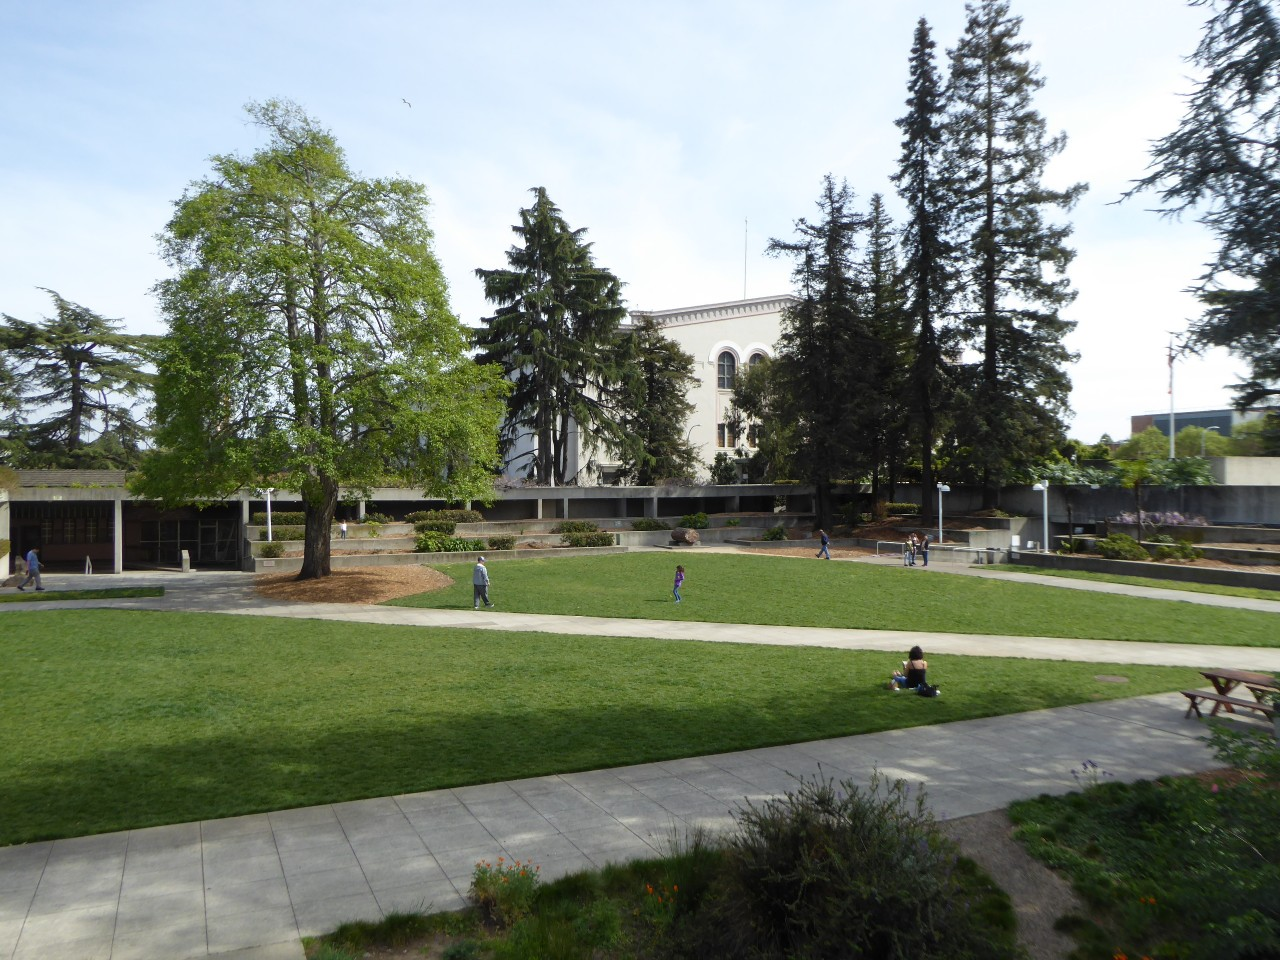 Central lawn + original trees